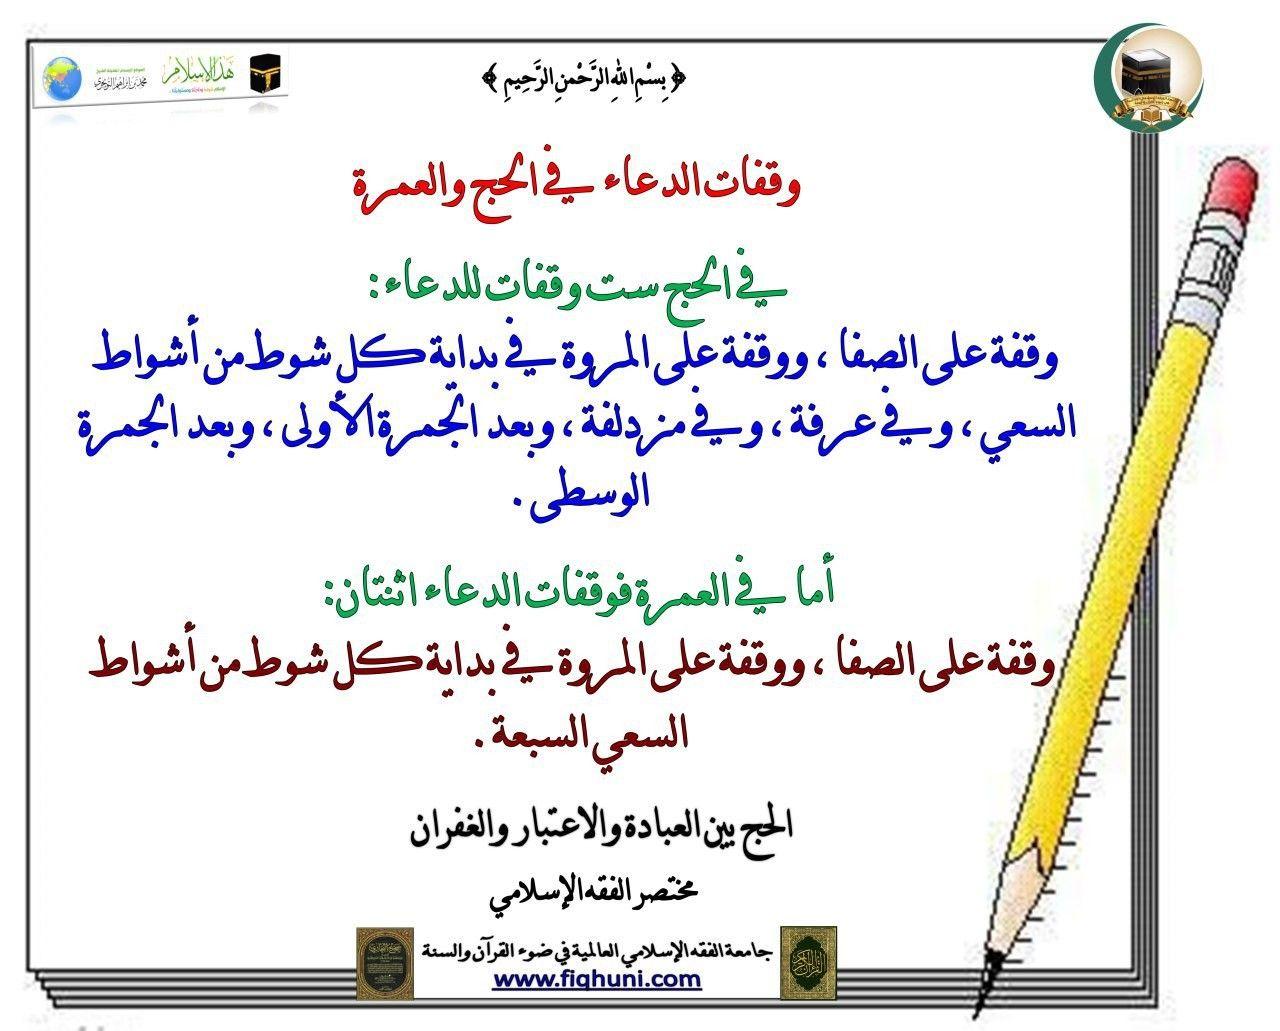 Pin By Iman Yousef On سورة الحج Math Arabic Calligraphy Calligraphy